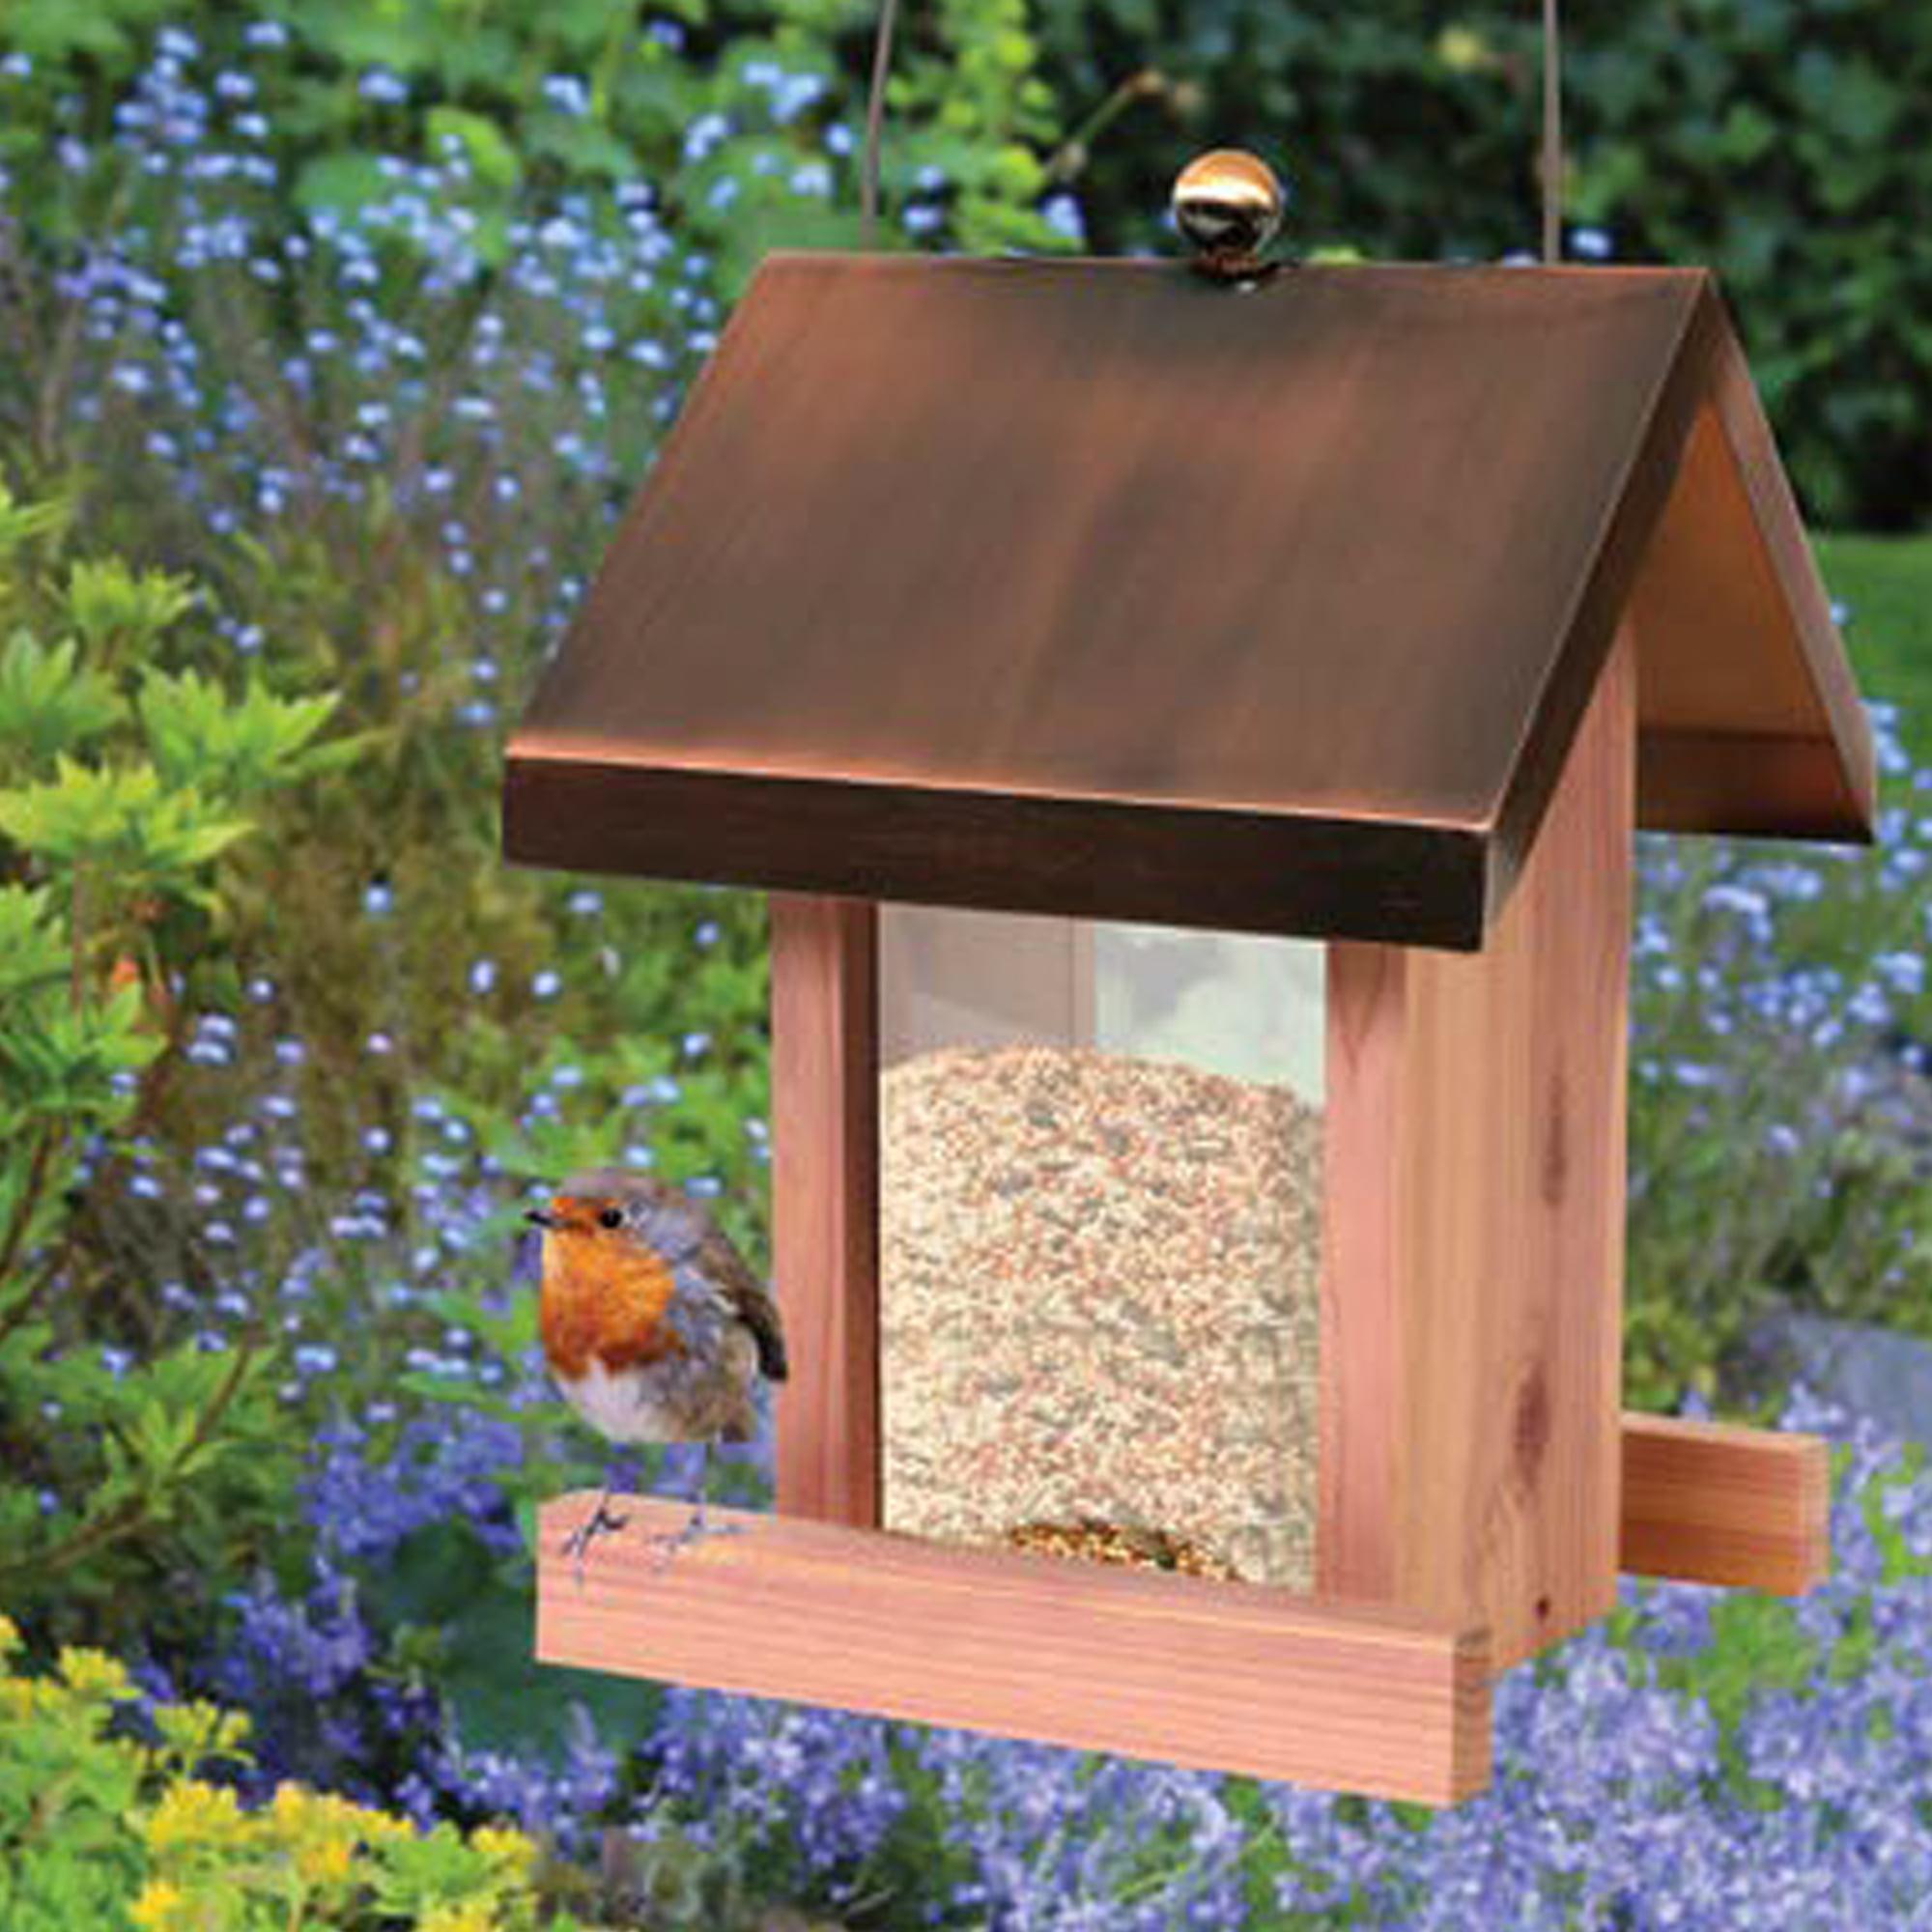 pennington copper roof villa wild bird feeder 1 5 lbs seed